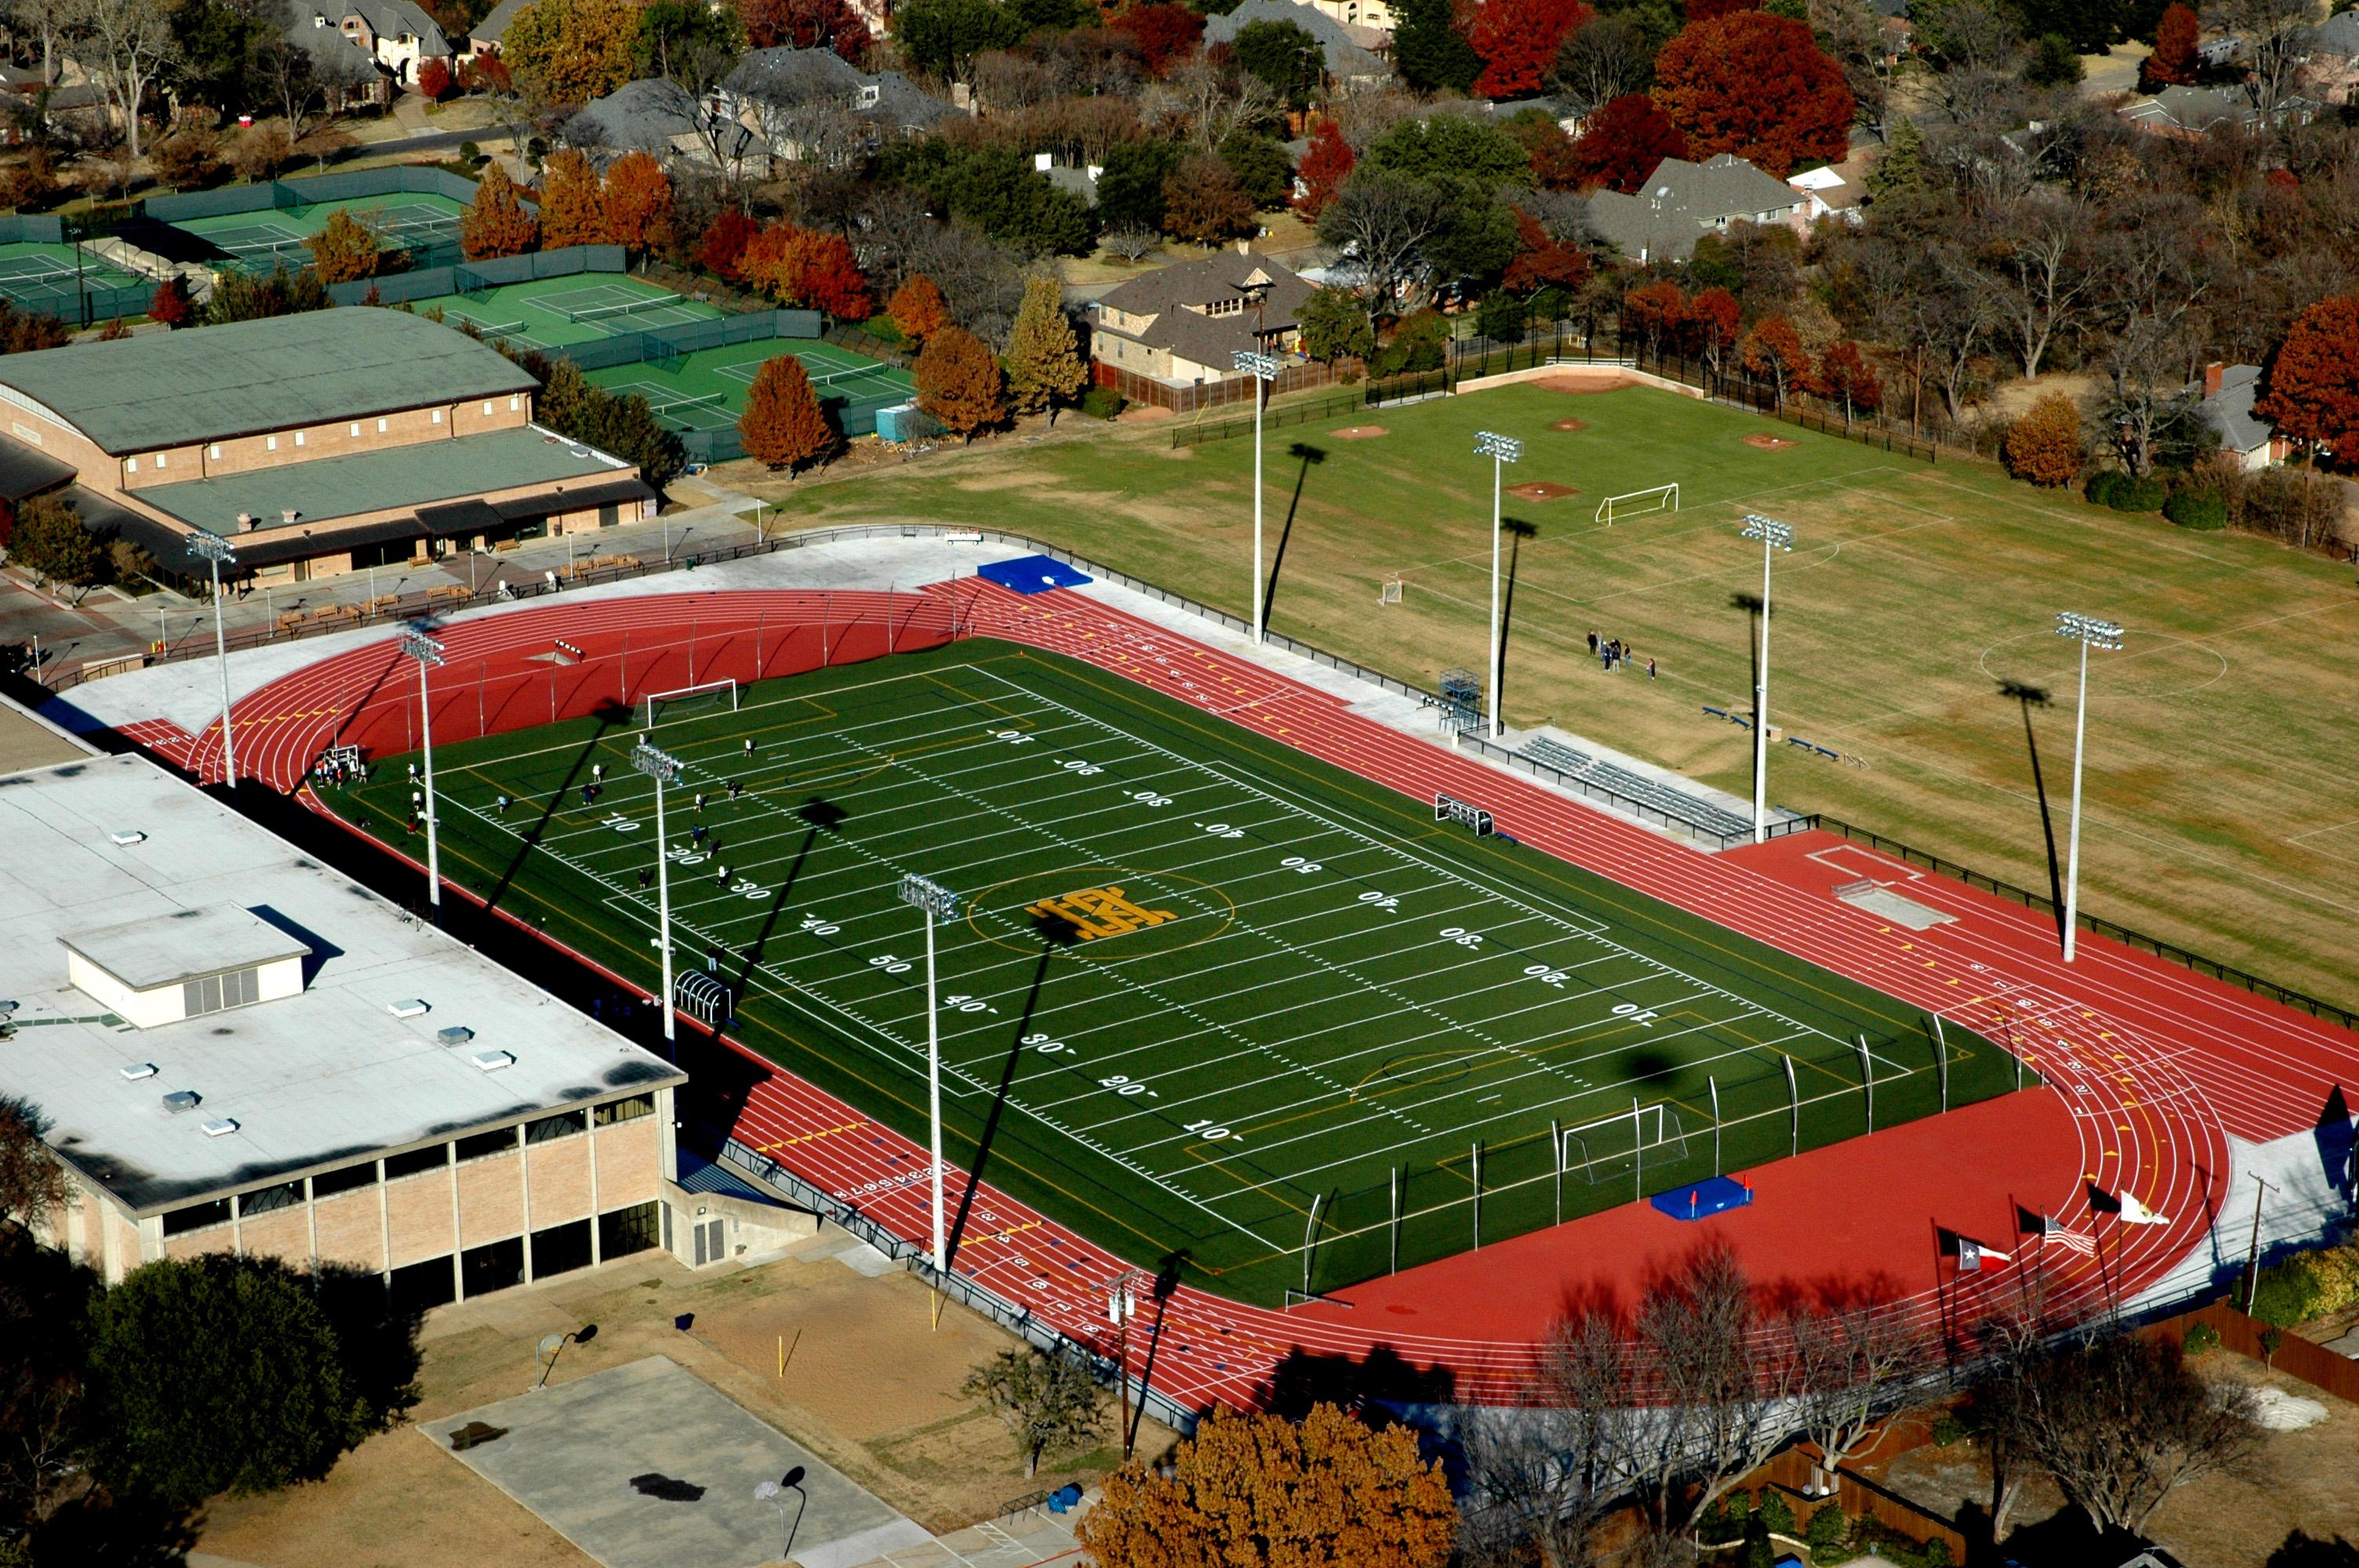 RLG St. Mark's Athletic Field